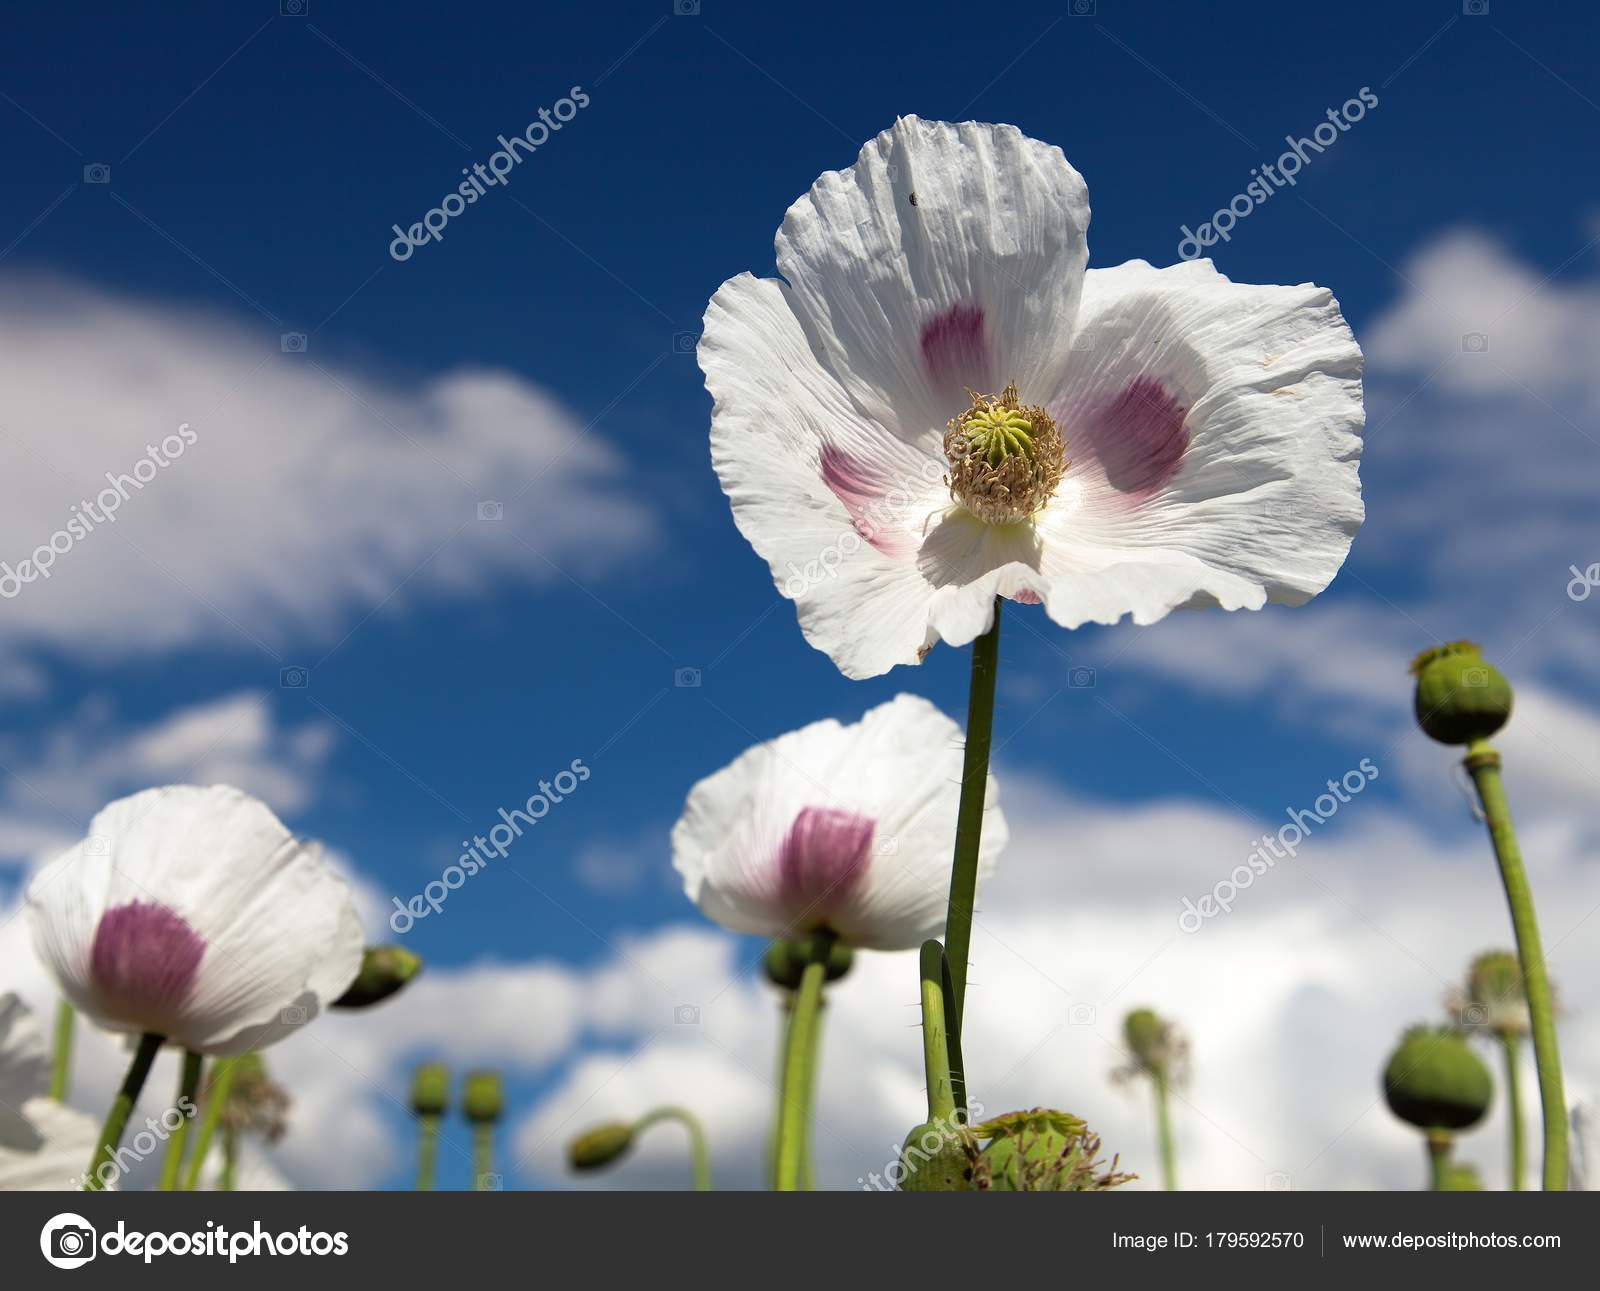 Detail Of Flowering Opium Poppy Poppy Field Stock Photo Prudek